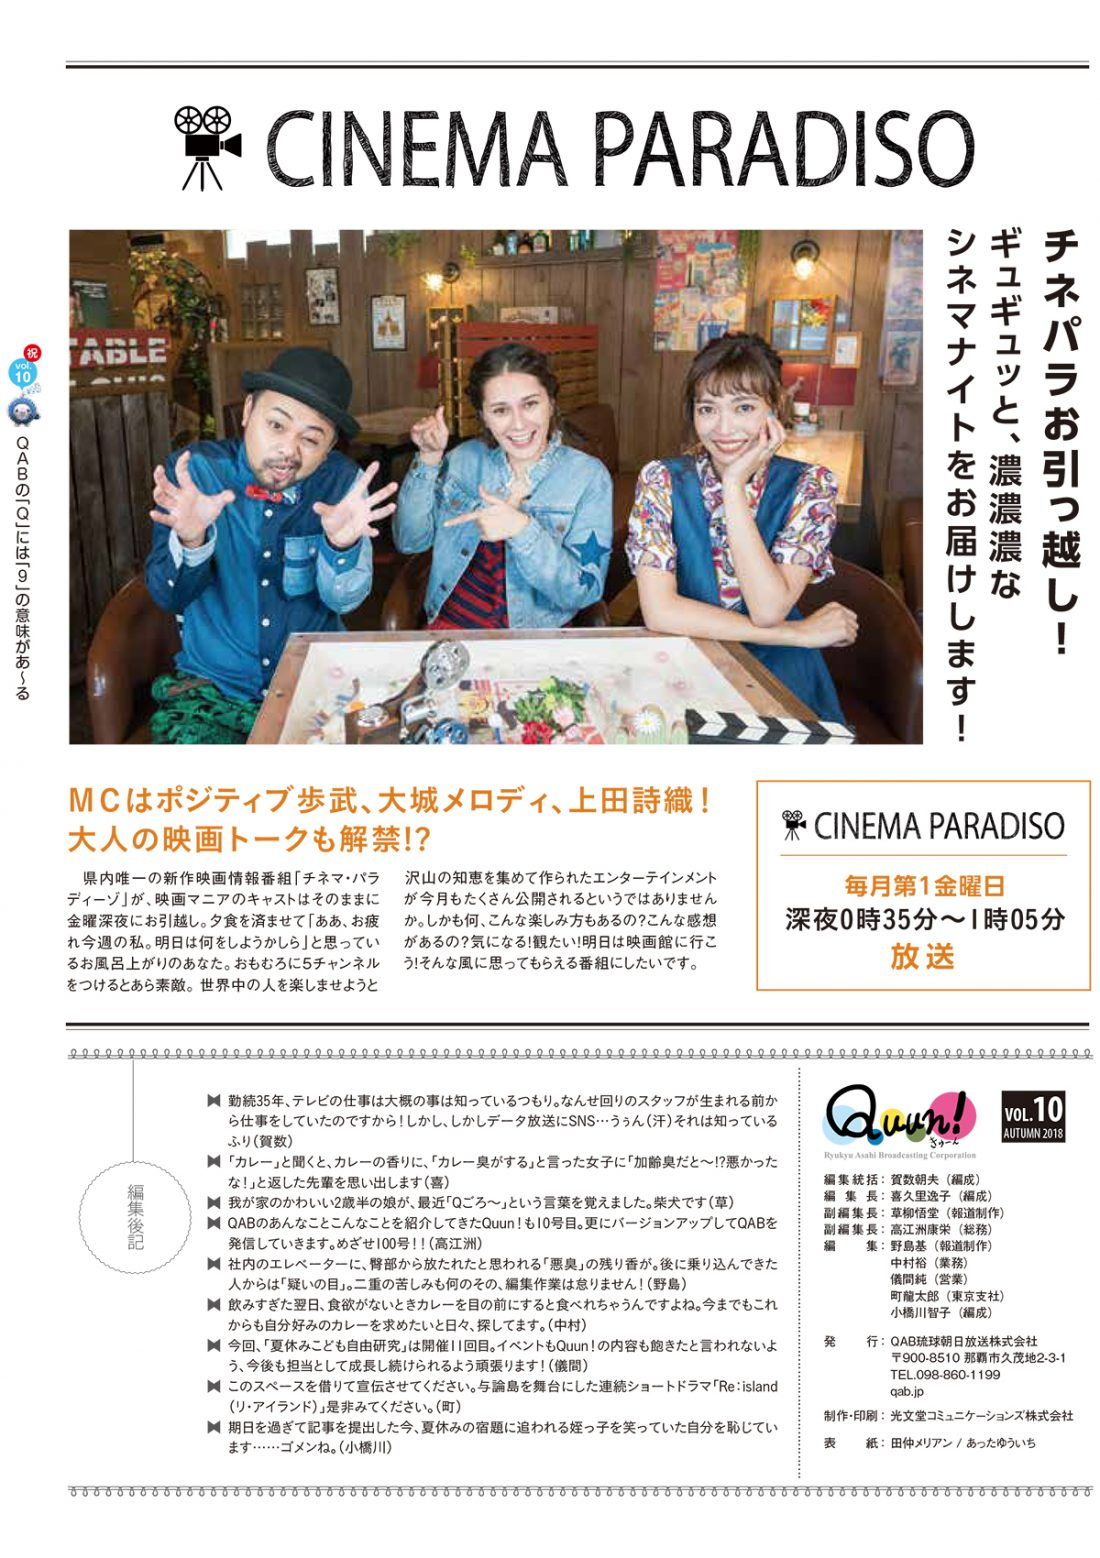 http://www.qab.co.jp/qgoro/wp-content/uploads/quun_1015-1100x1558.jpg